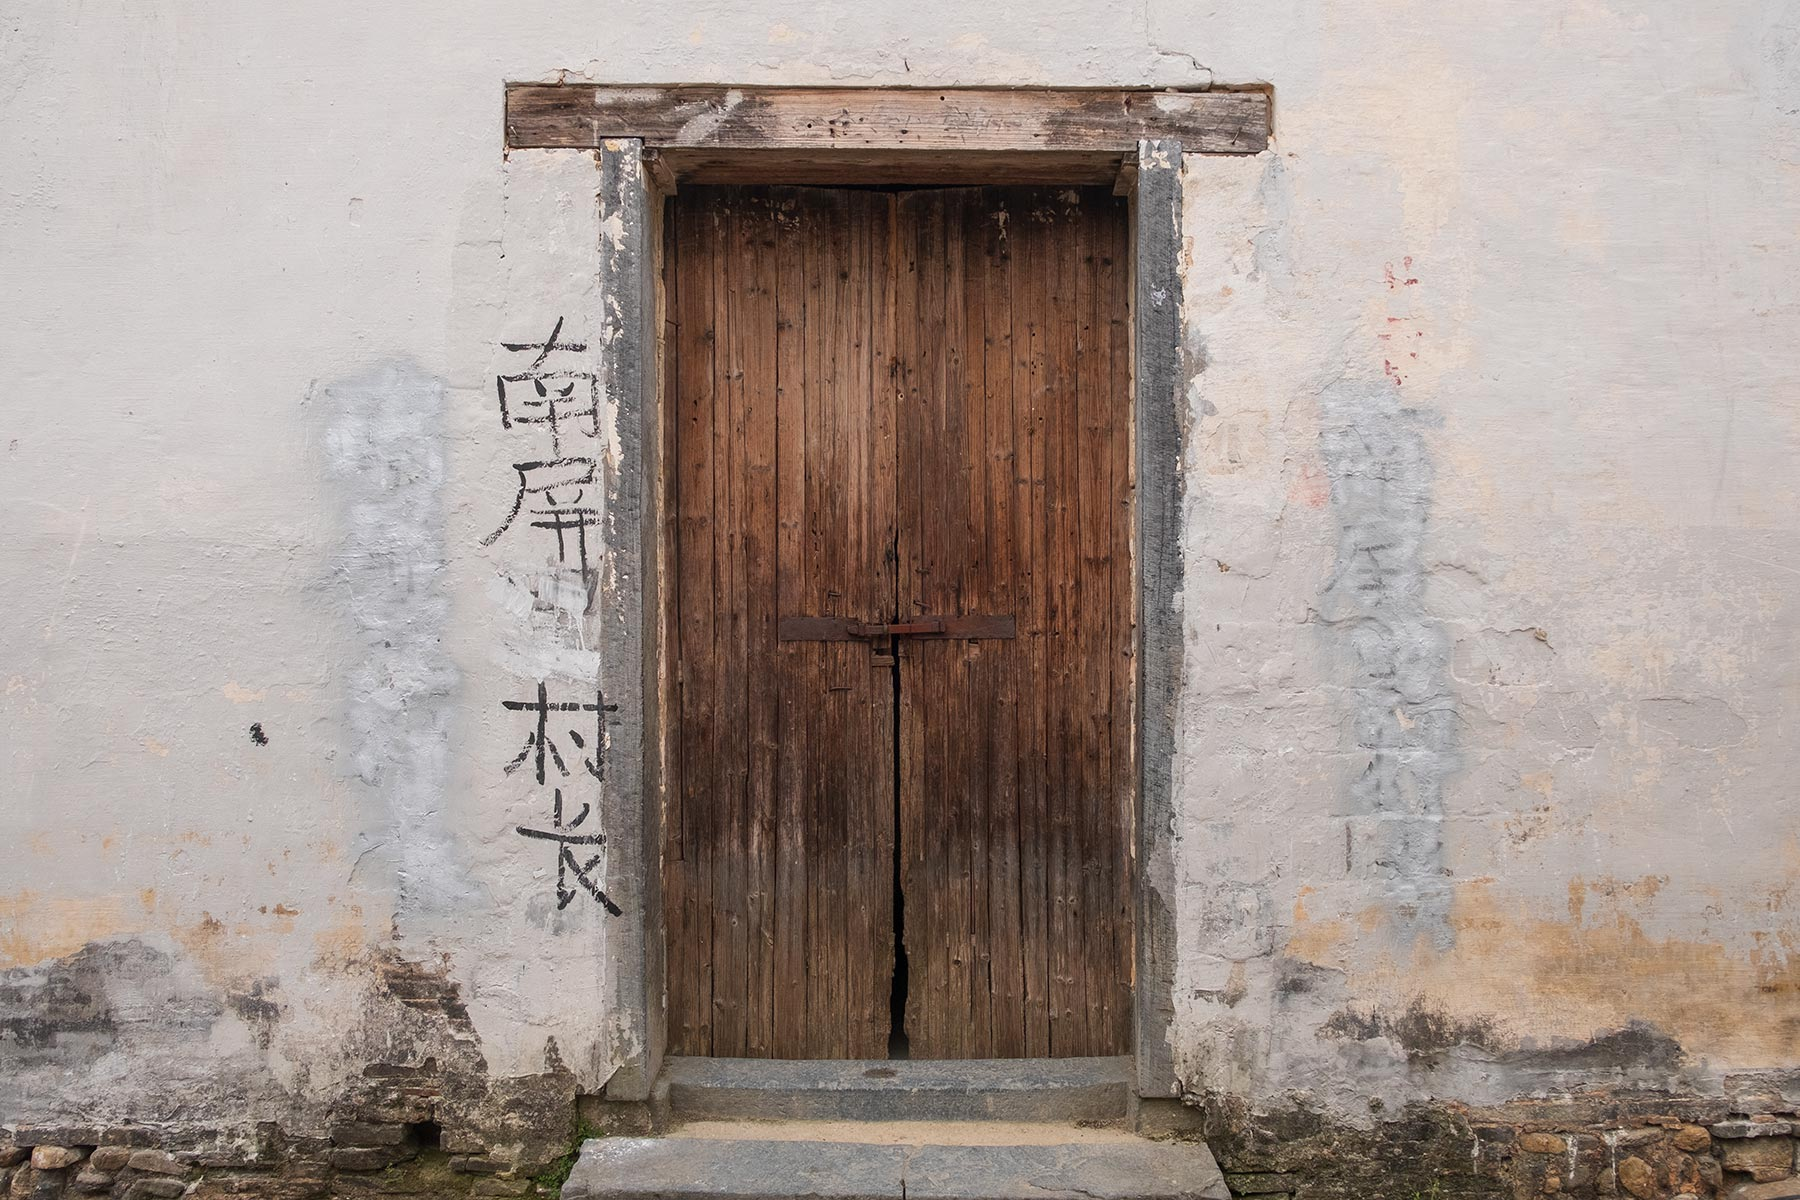 Tür des Bürgermeisters in Altstadt Nanping in Anhui, China